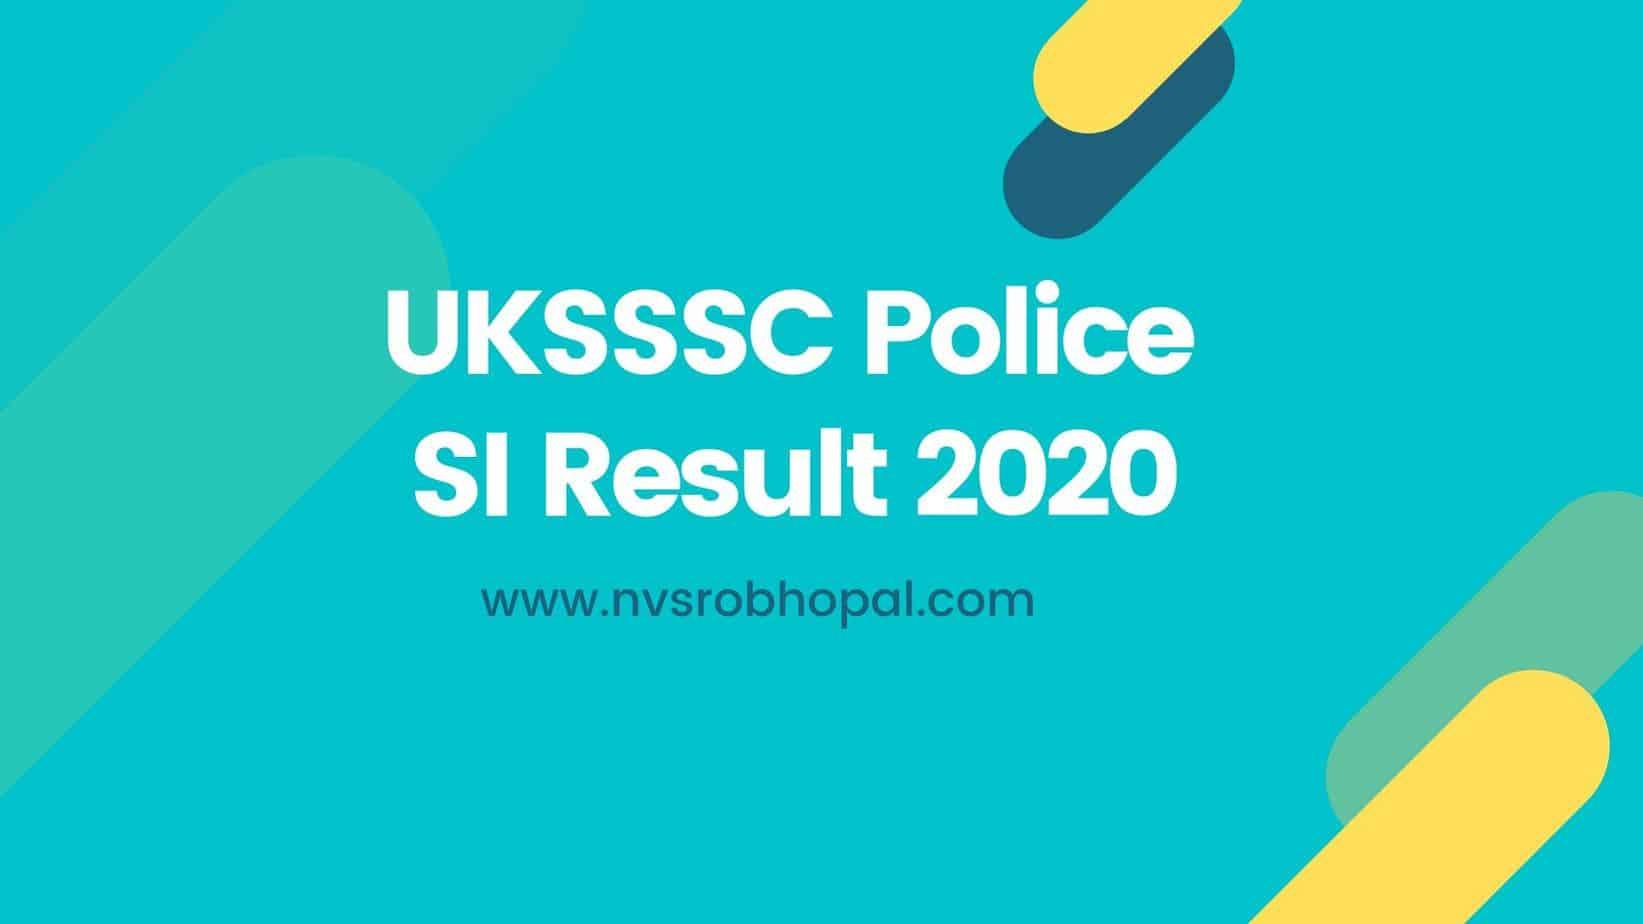 Photo of UKSSSC Police SI Result 2020 Uttarakhand Sub Inspector Merit List, Cut off Marks (Latest Update)